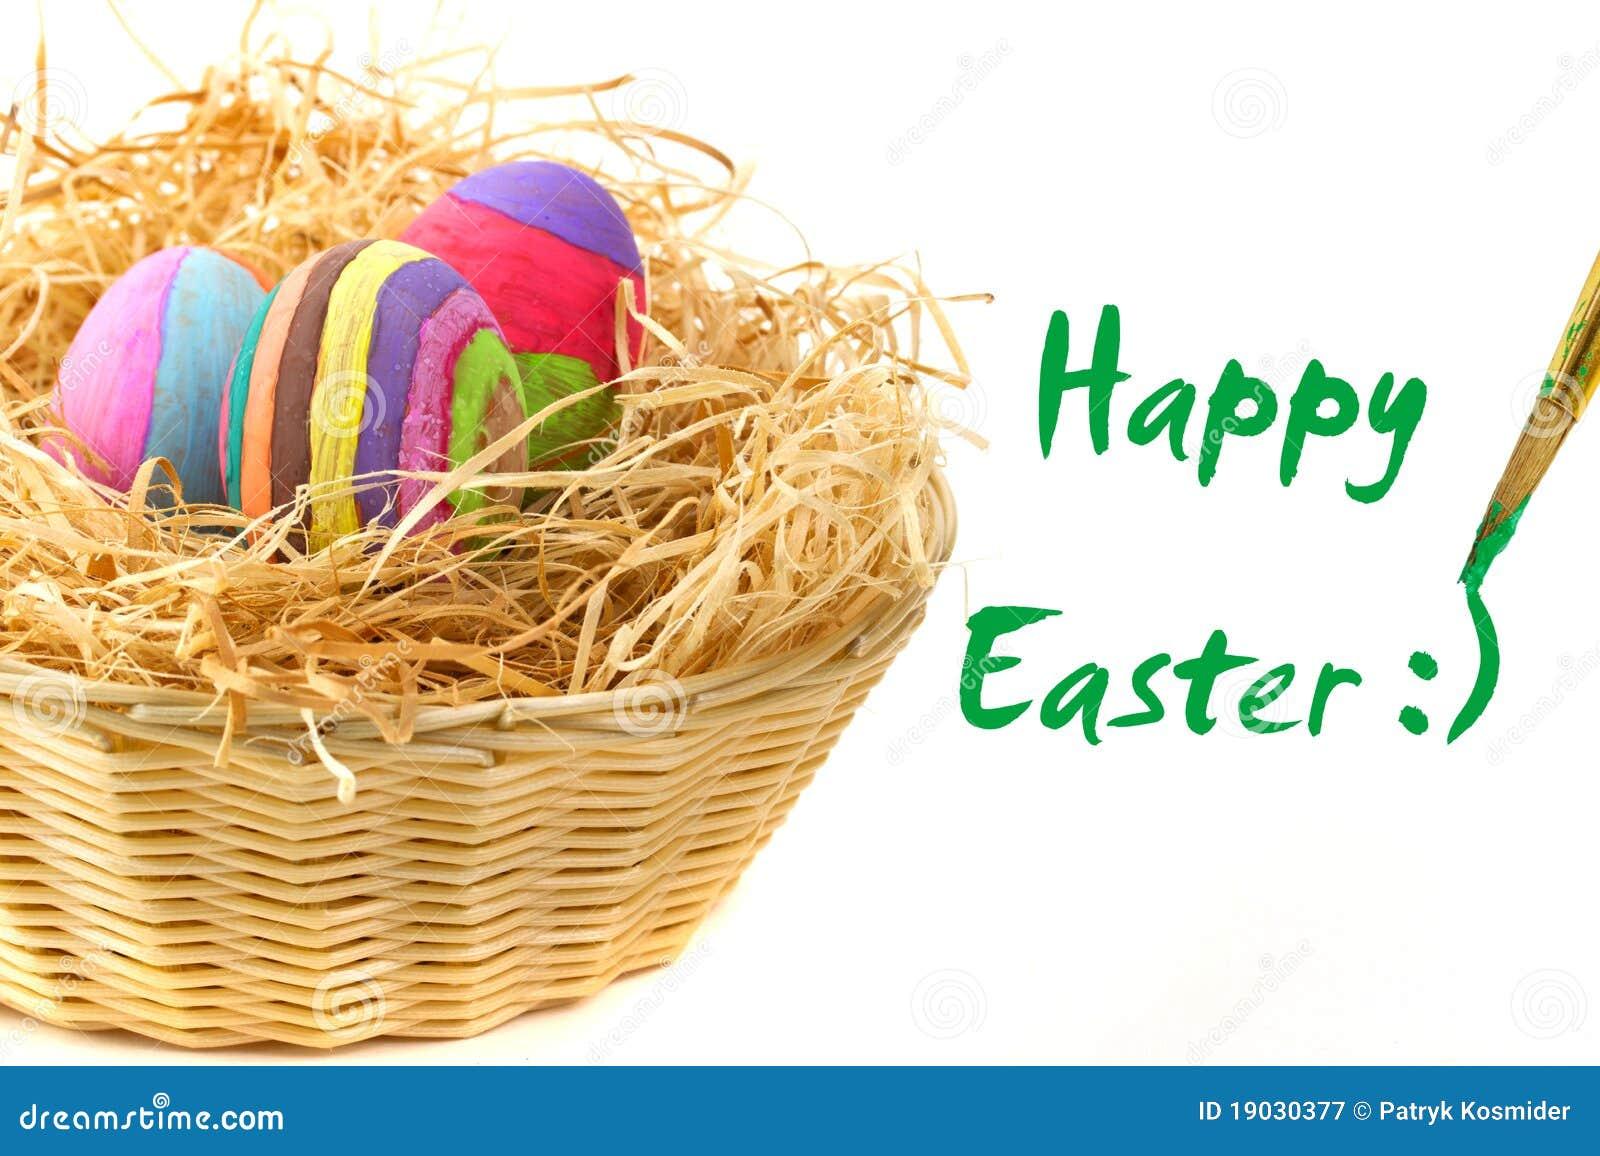 easter eggs happy food - photo #13